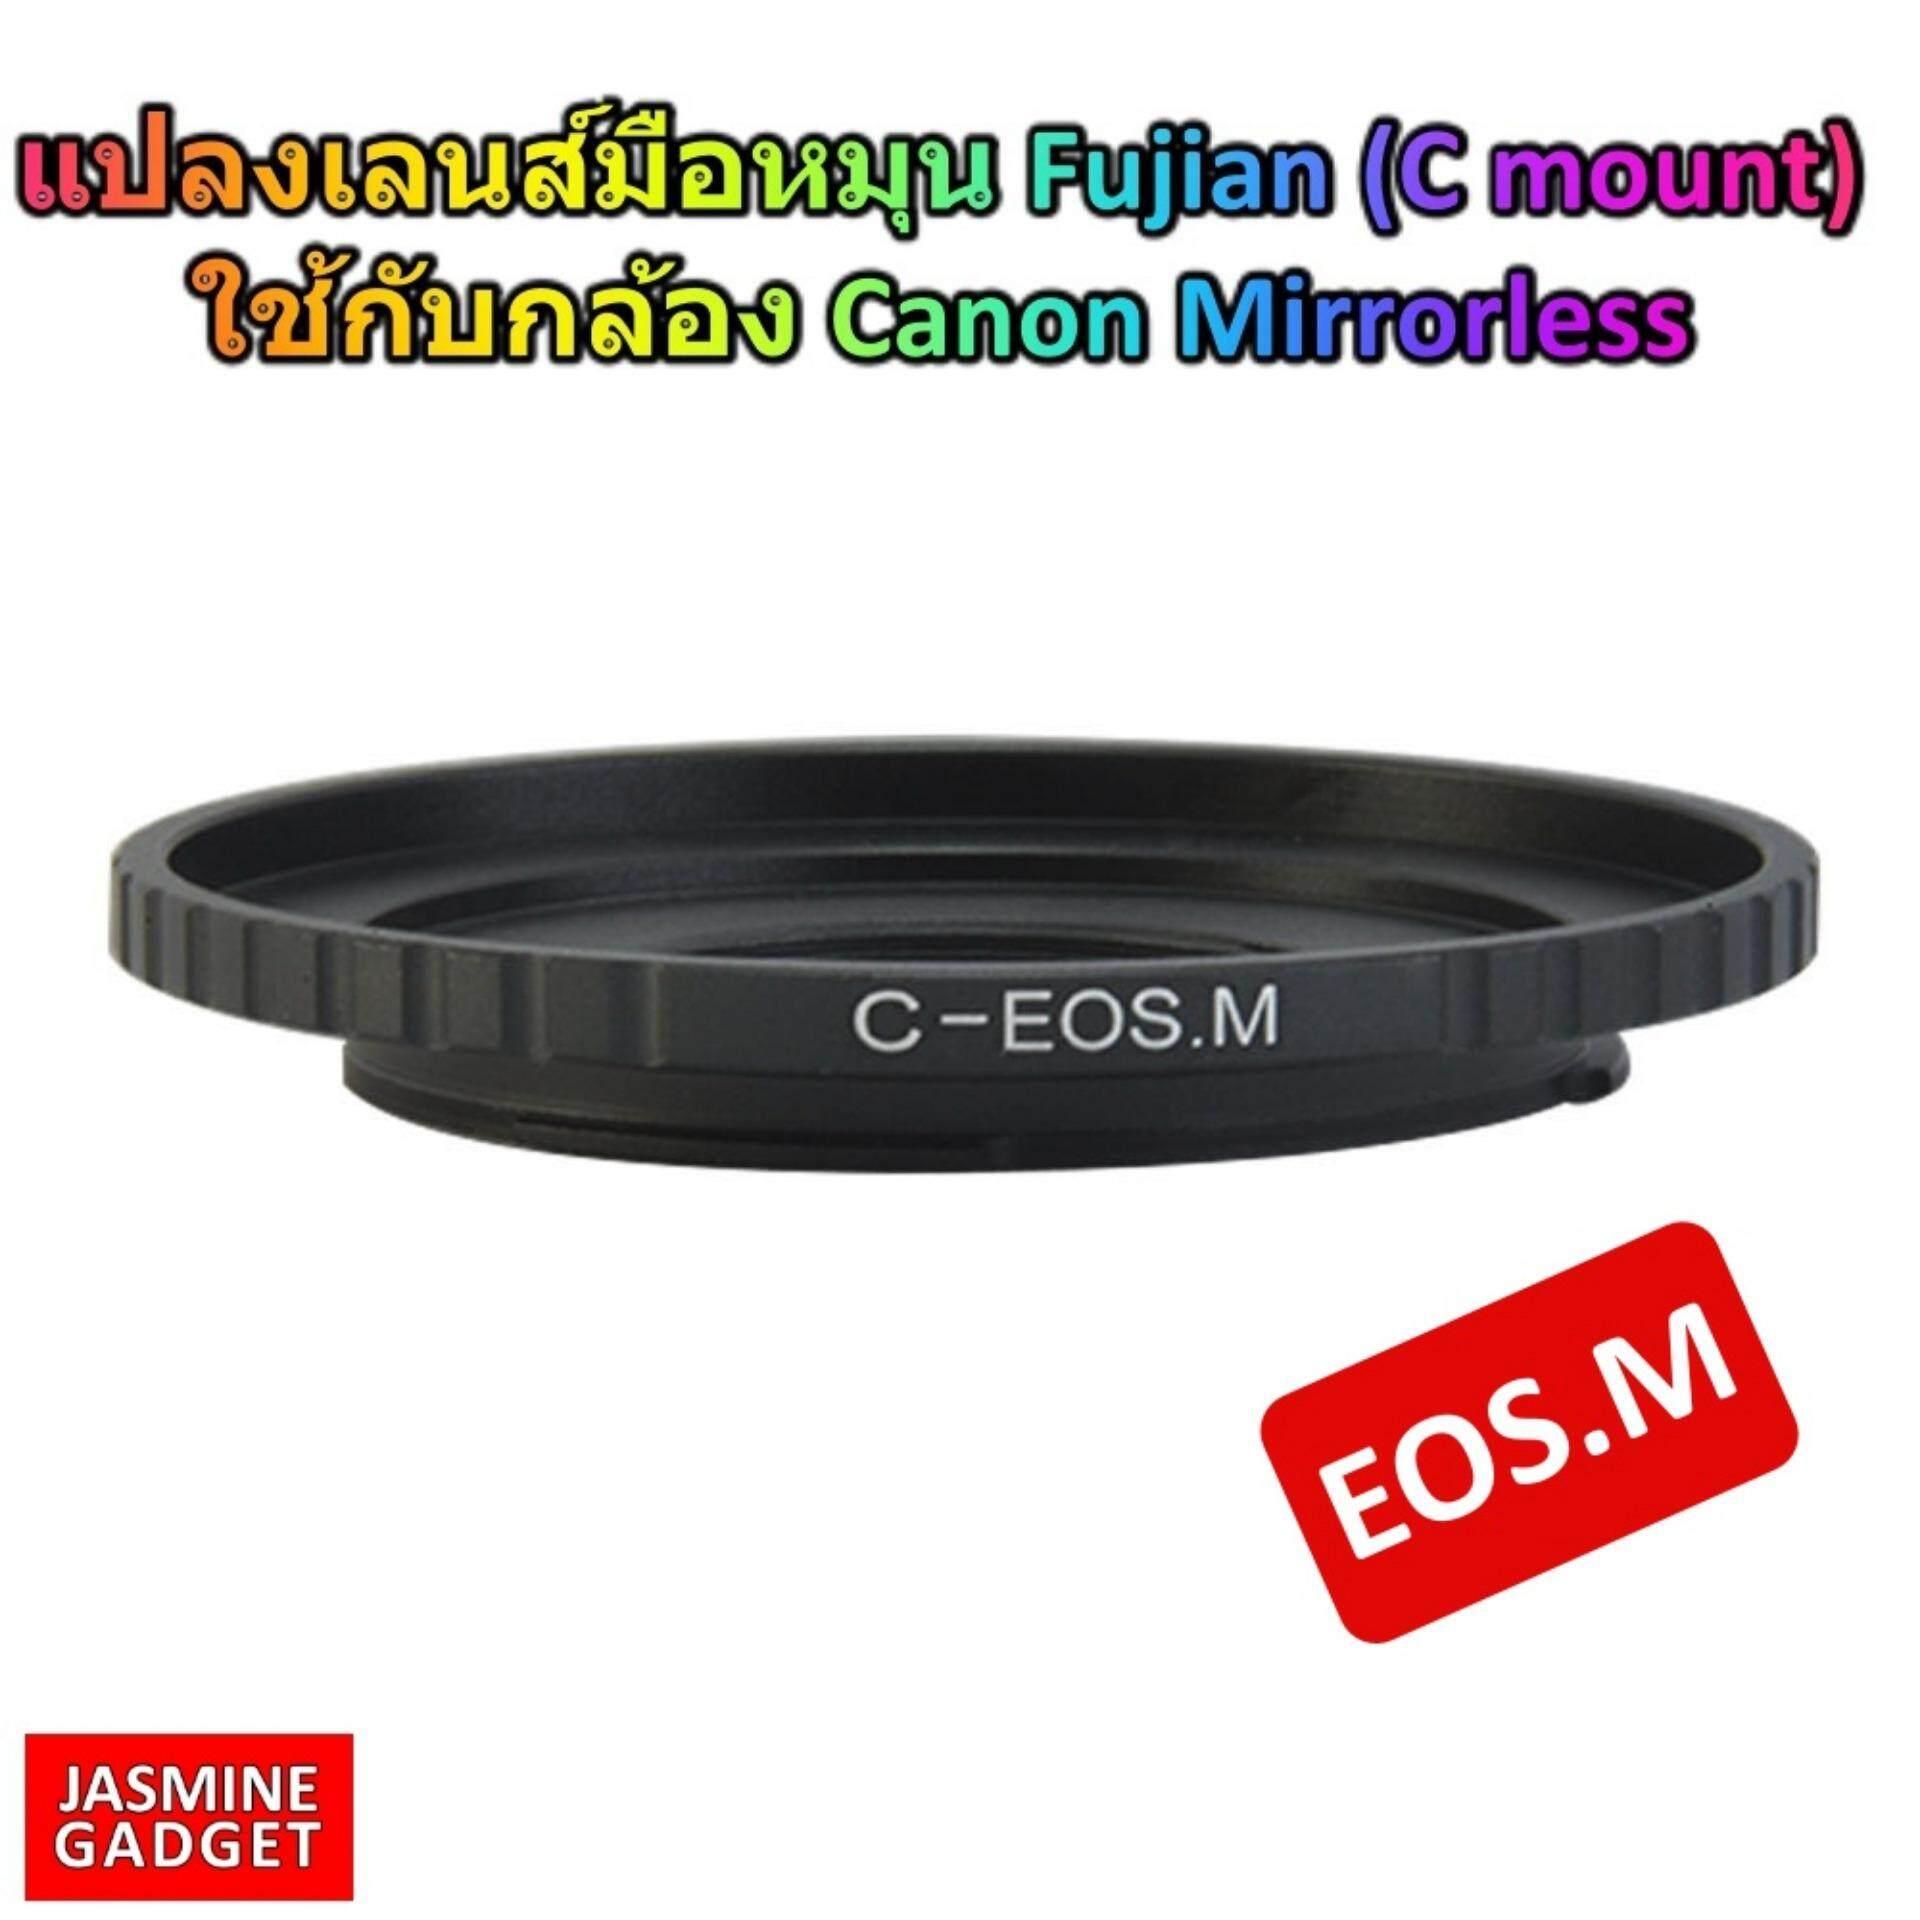 Canon Adaptor C-Eos.m For แปลงเลนส์ C-Mount Fujian เพื่อใช้งานกับกล้องค่าย Canon M เช่น Canon Eos M10,m5,m3 [มีประกัน].